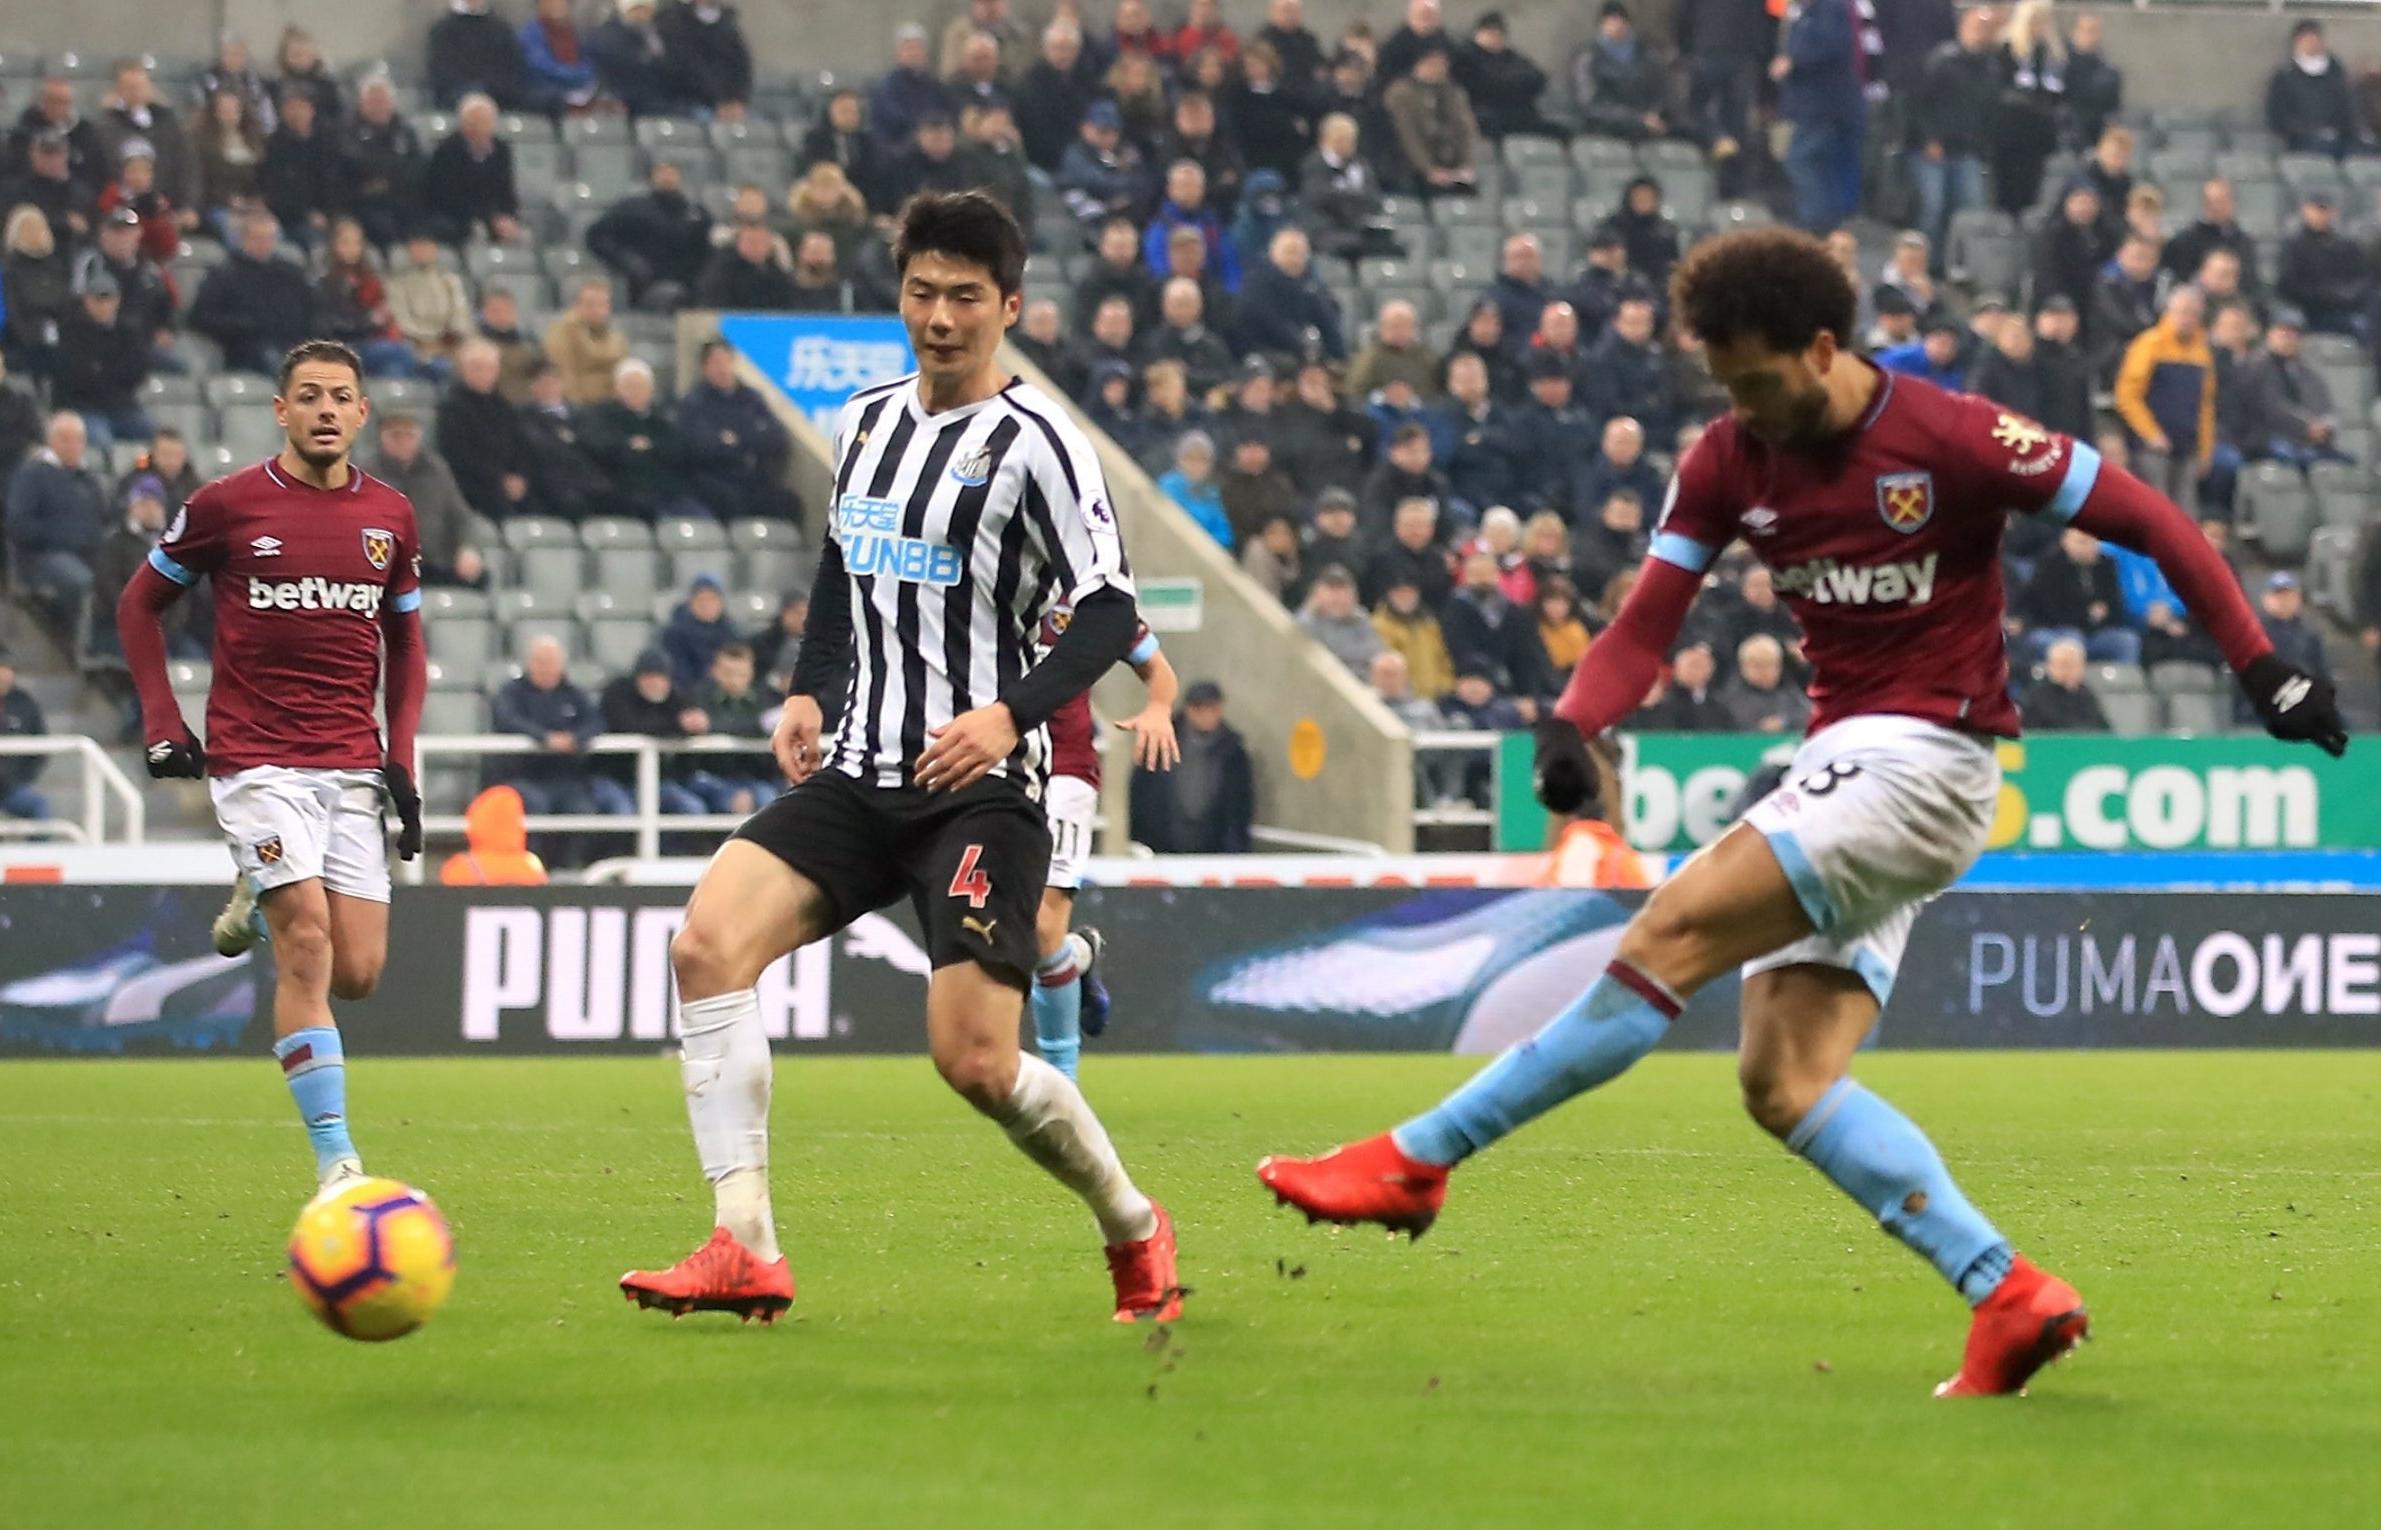 Xem trực tiếp West Ham Utd vs Newcastle ở đâu?